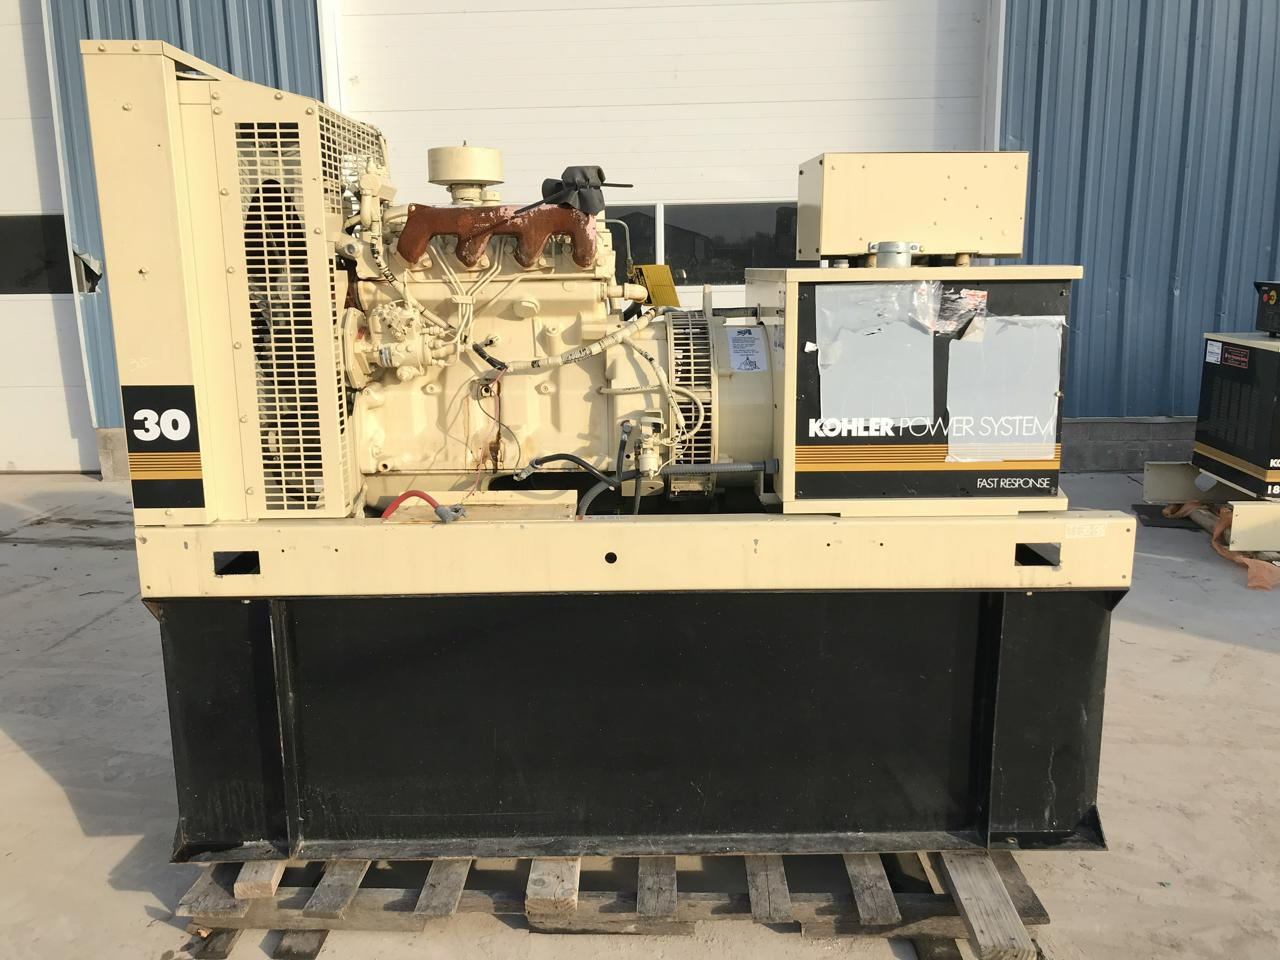 __33 kW Kohler Generator, Base Fuel Tank, 12 Lead Reconnectable, John Deere  Engine